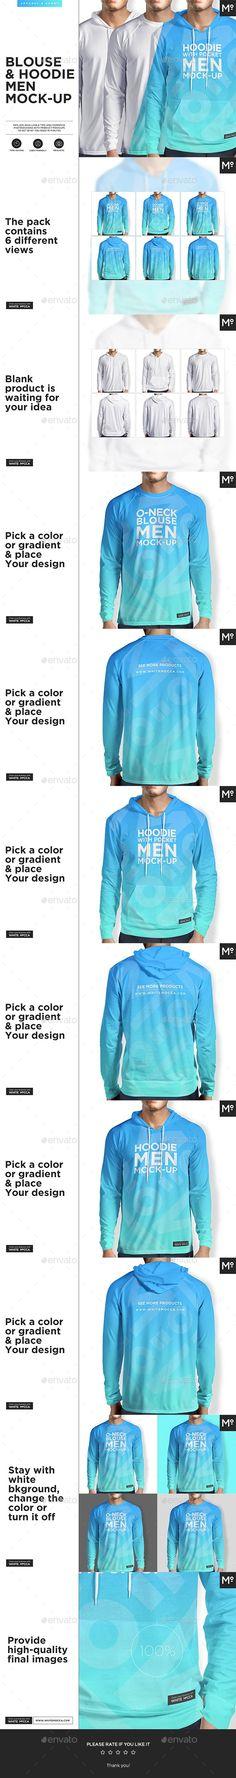 Download 8 Design Effects Ideas Photoshop Video Tutorials Photoshop Extensions Photoshop Video